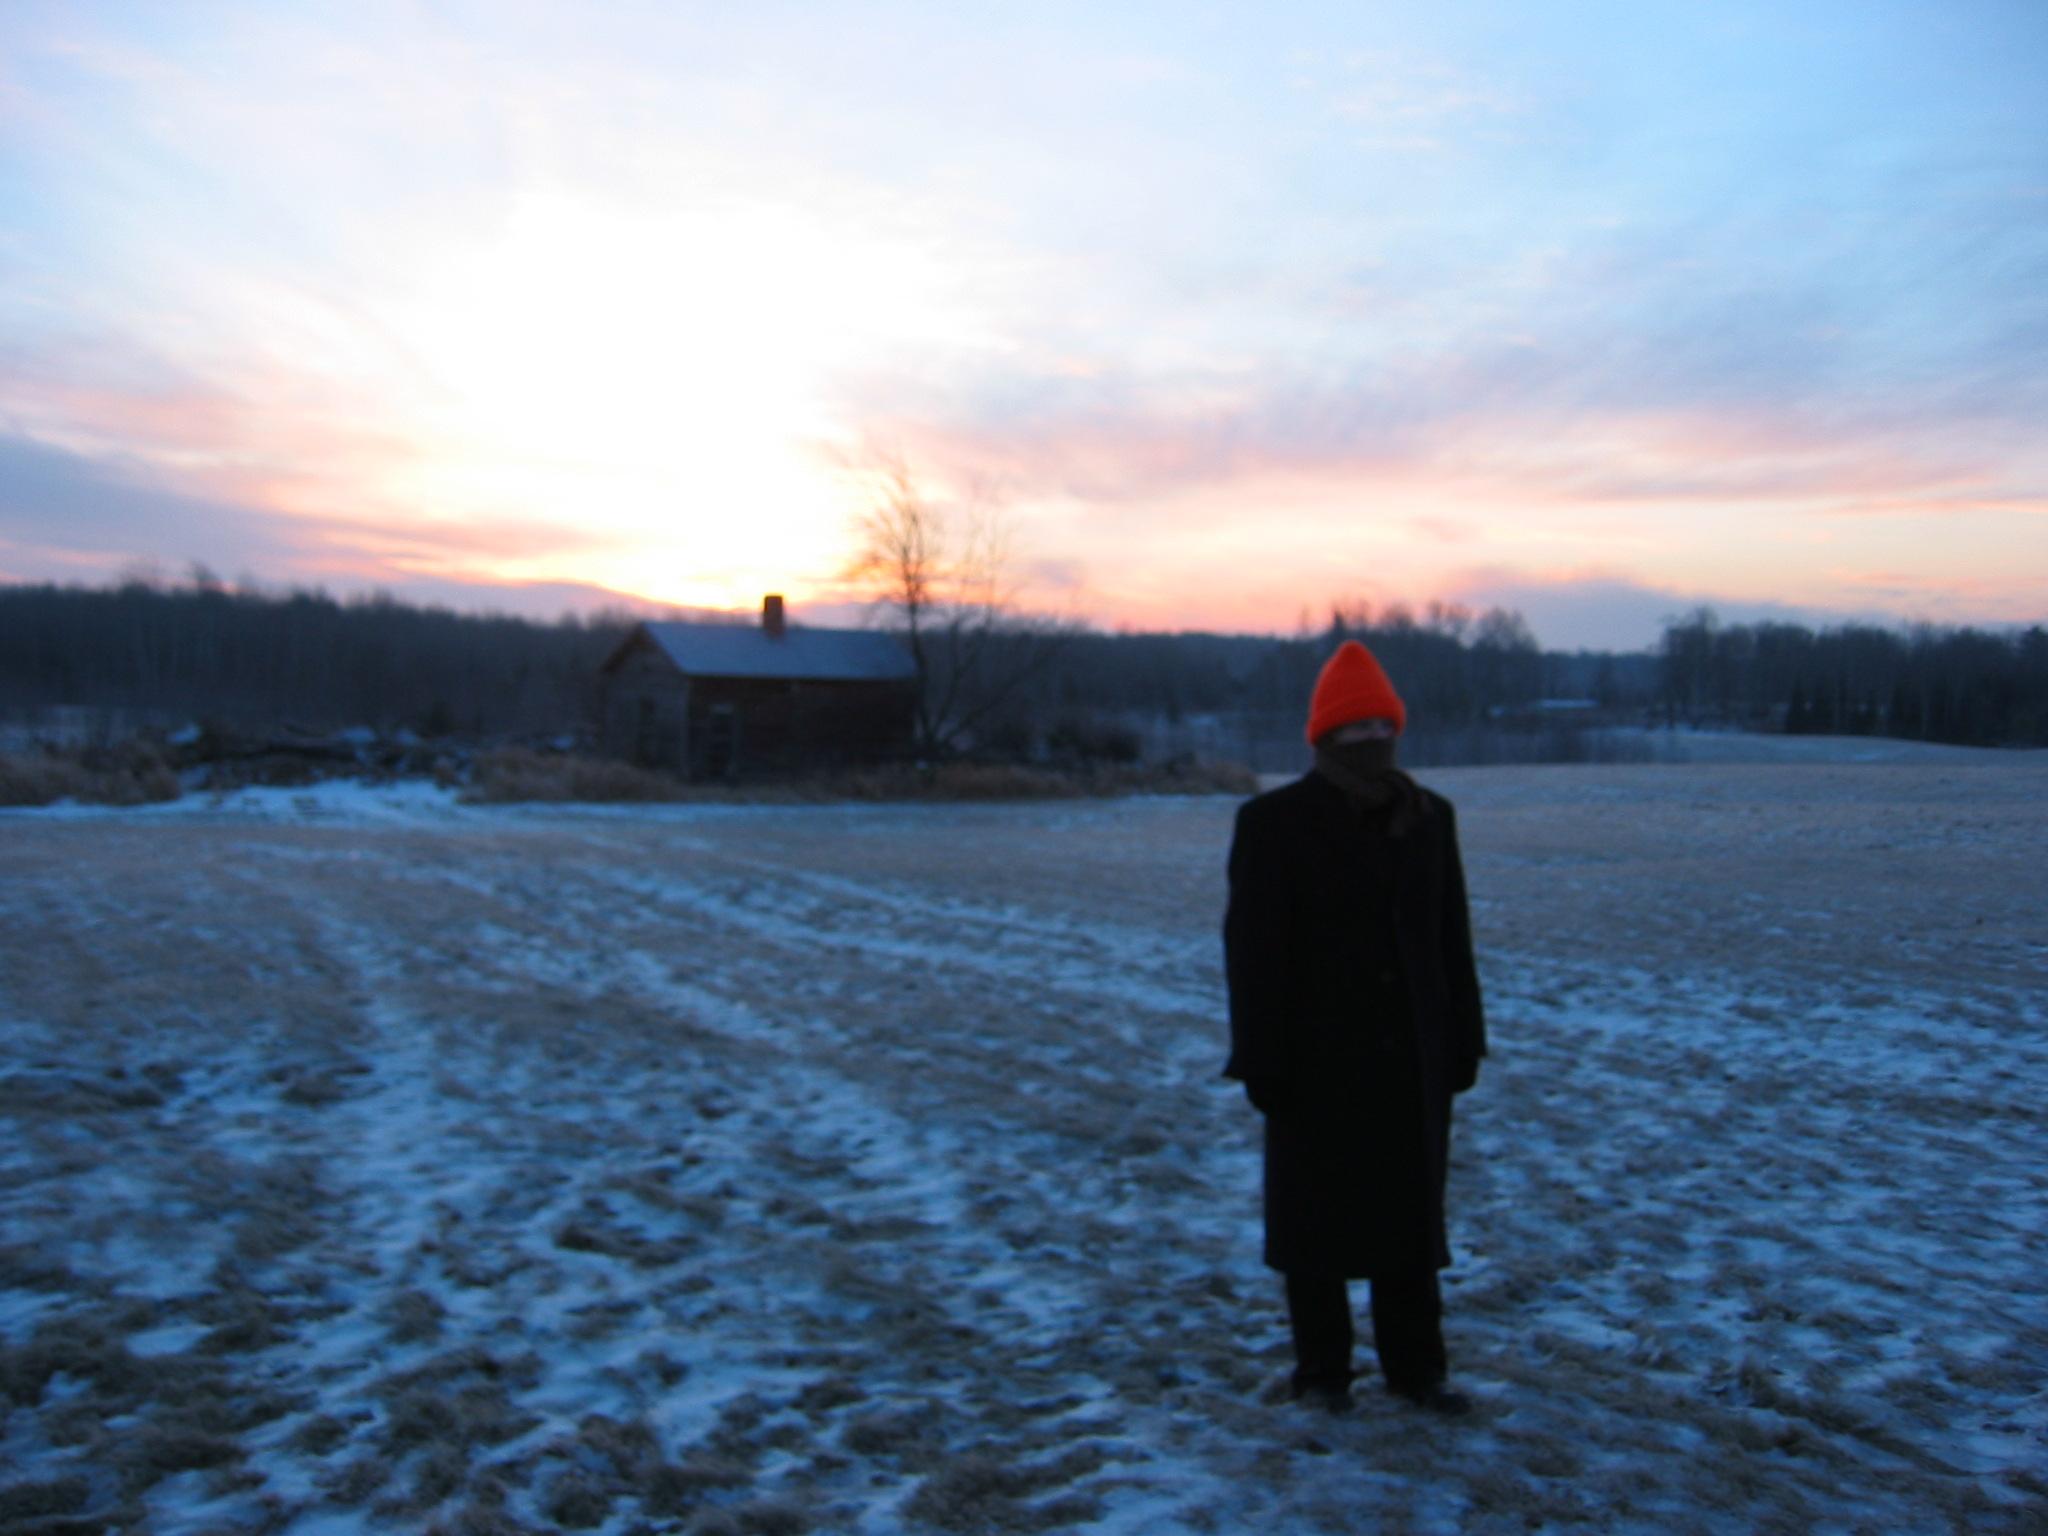 December 2002, Sauna